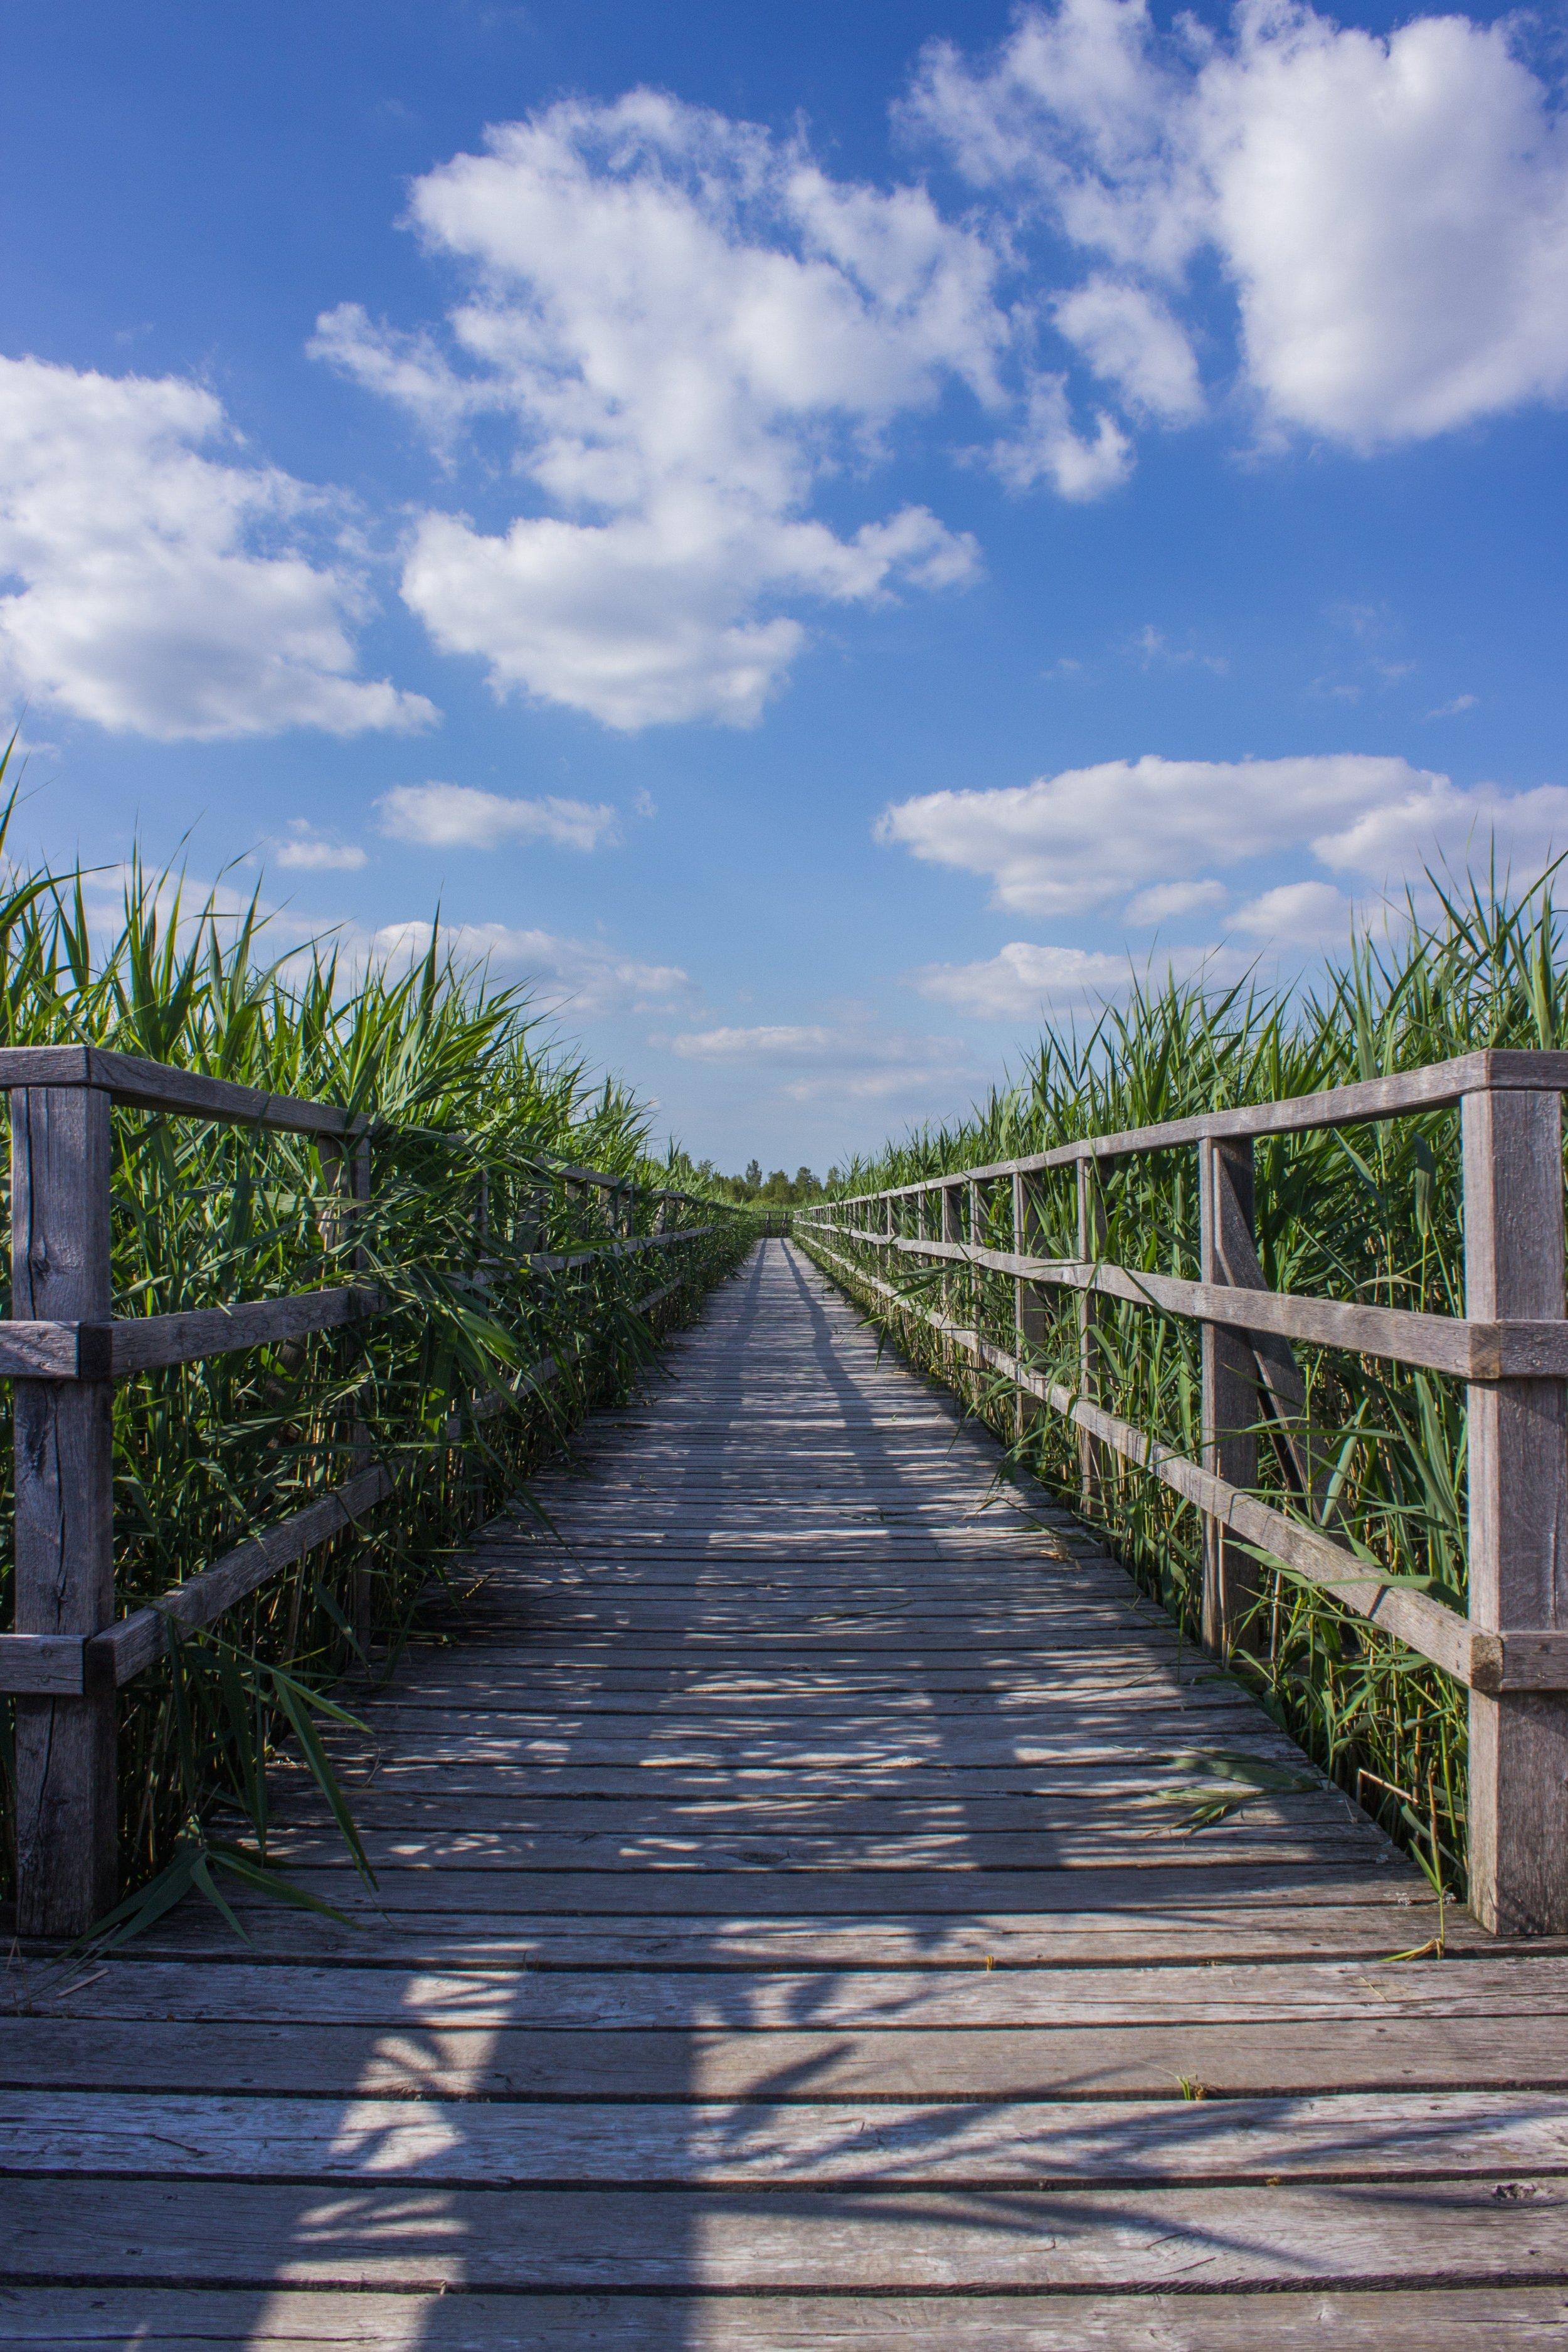 boardwalk-bridge-cloud-276272.jpg